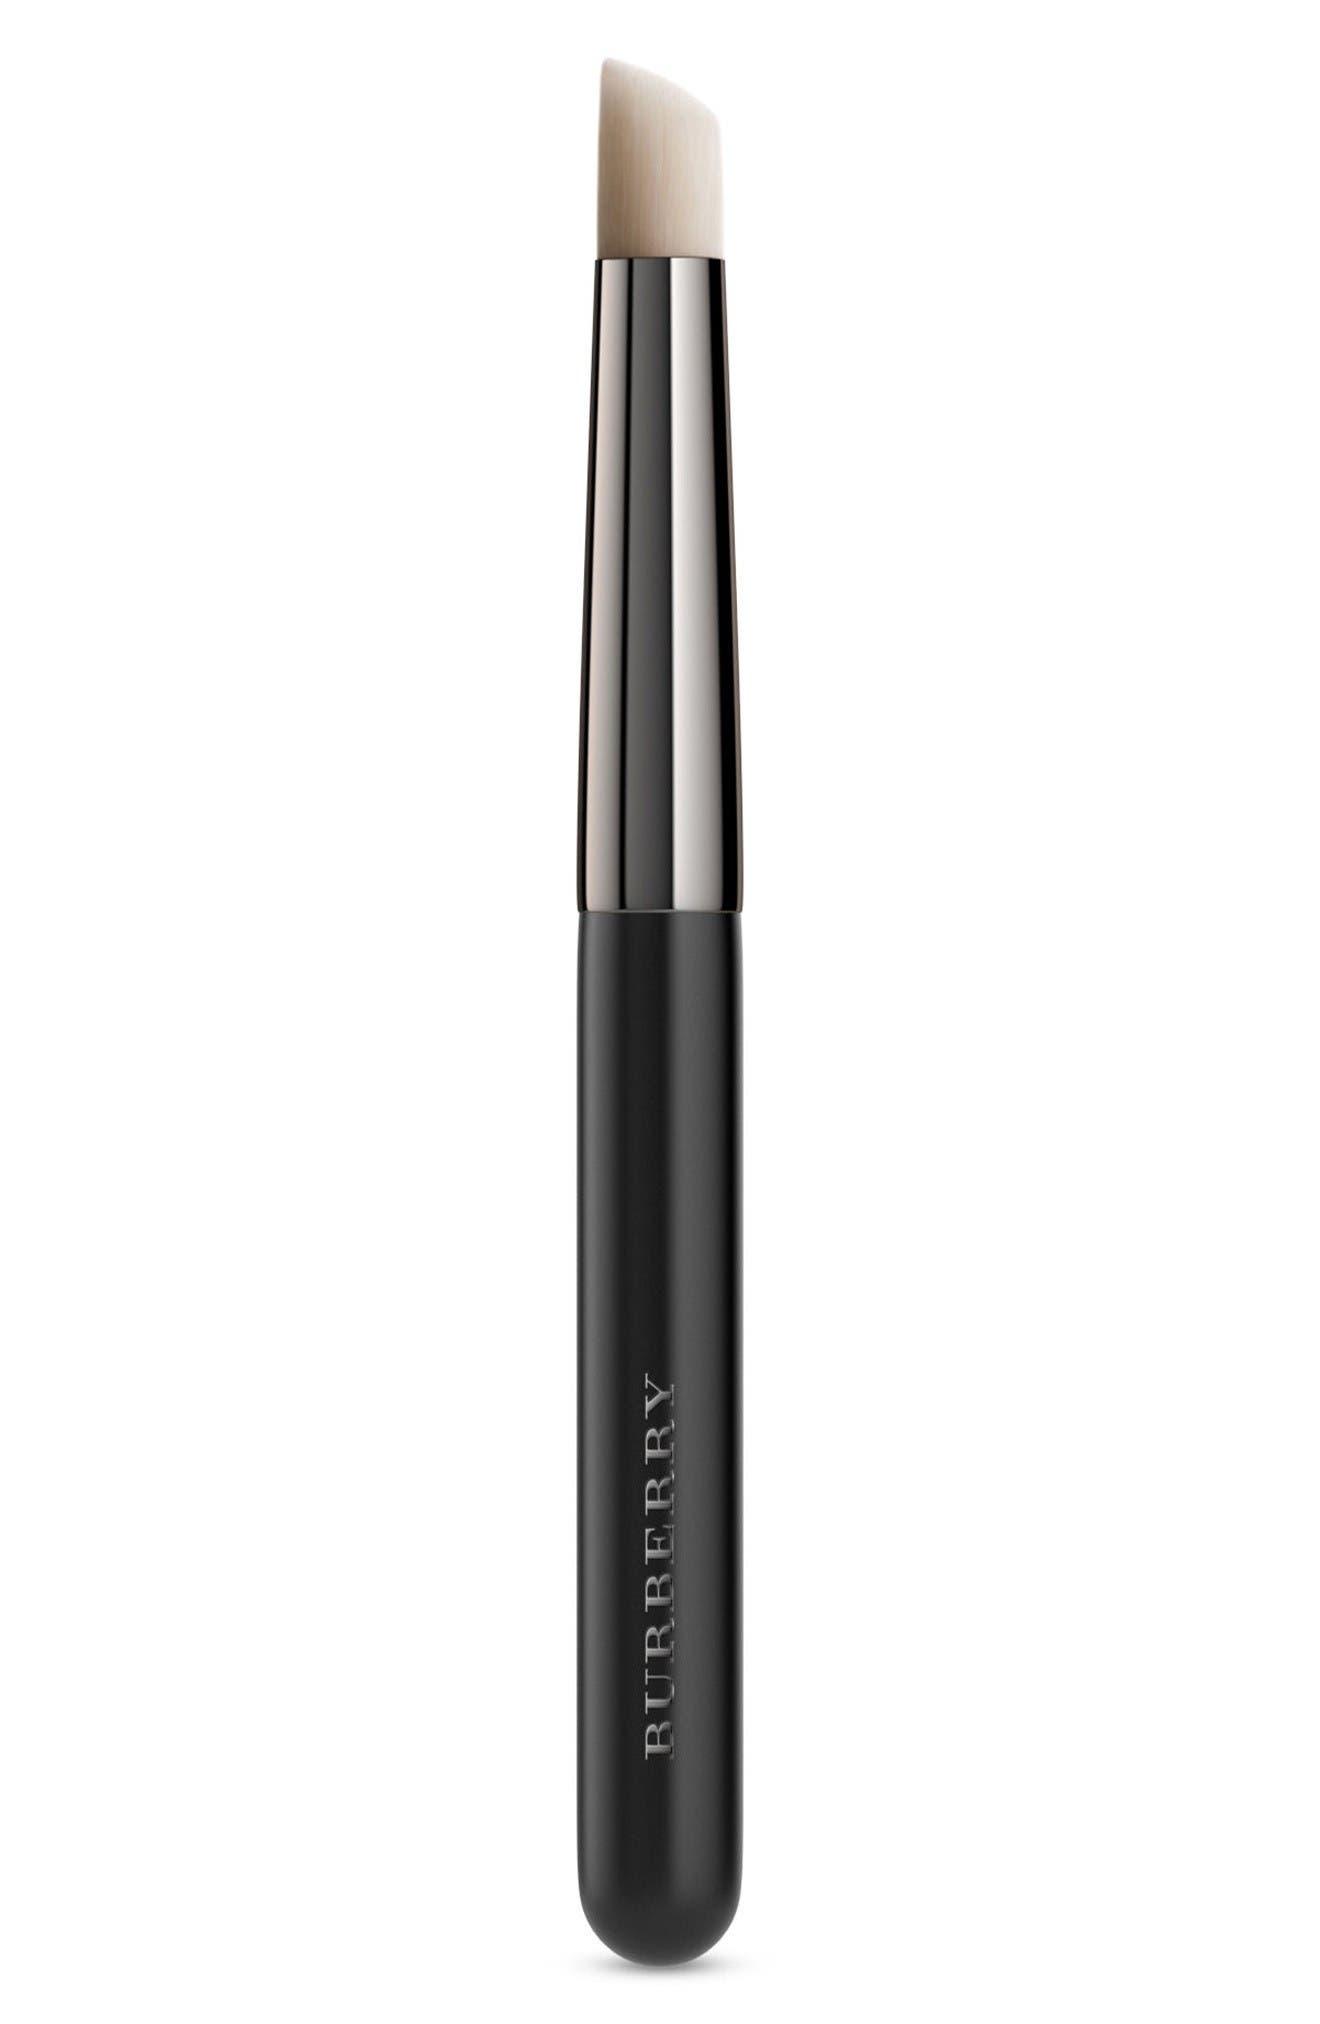 Main Image - Burberry Beauty Smoke & Sculpt Brush No. 14